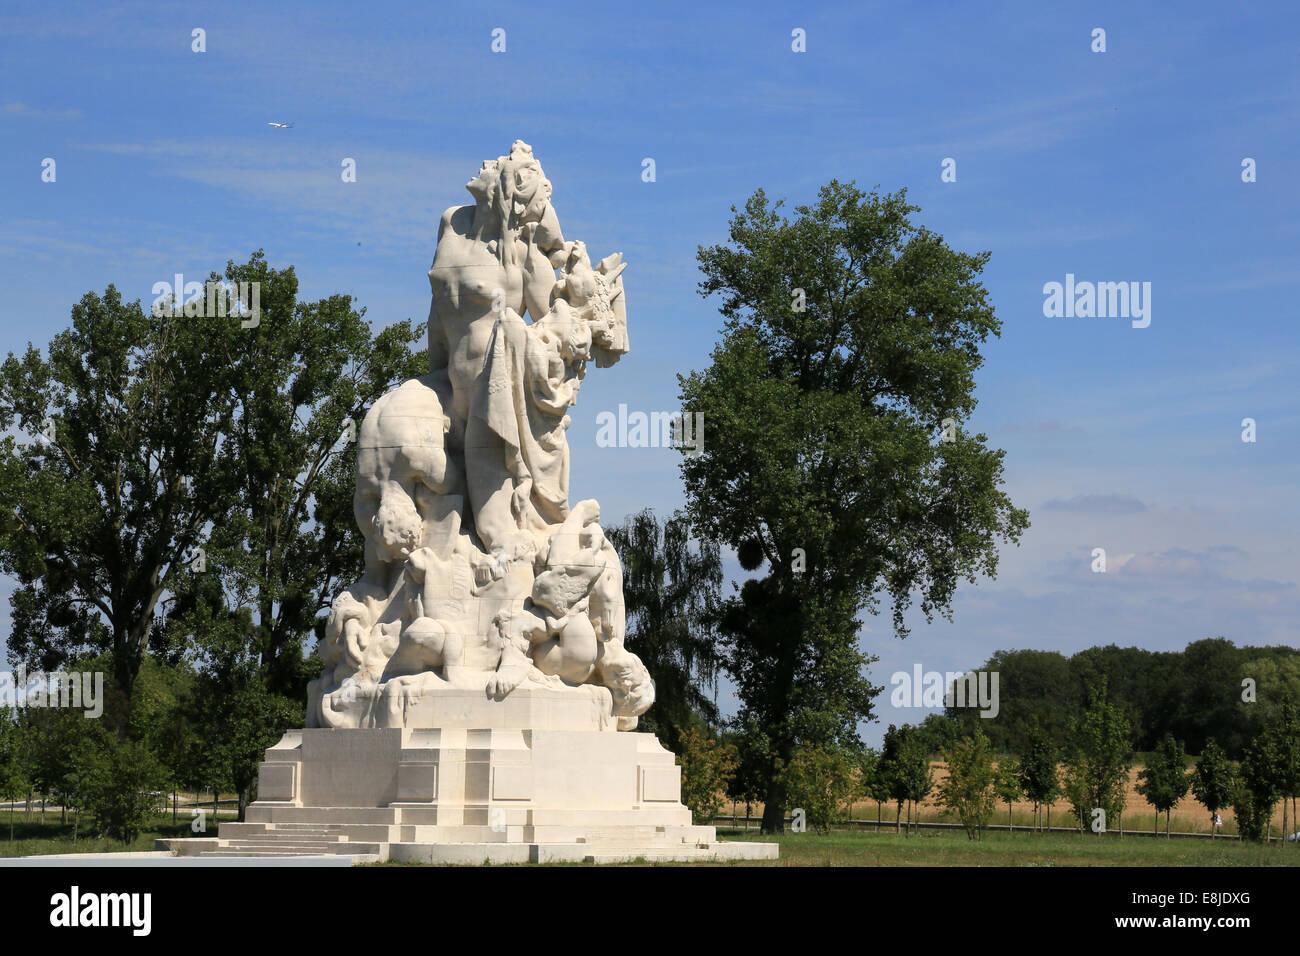 20 Meters High : Sculpture of the italian quatrachi meters high it